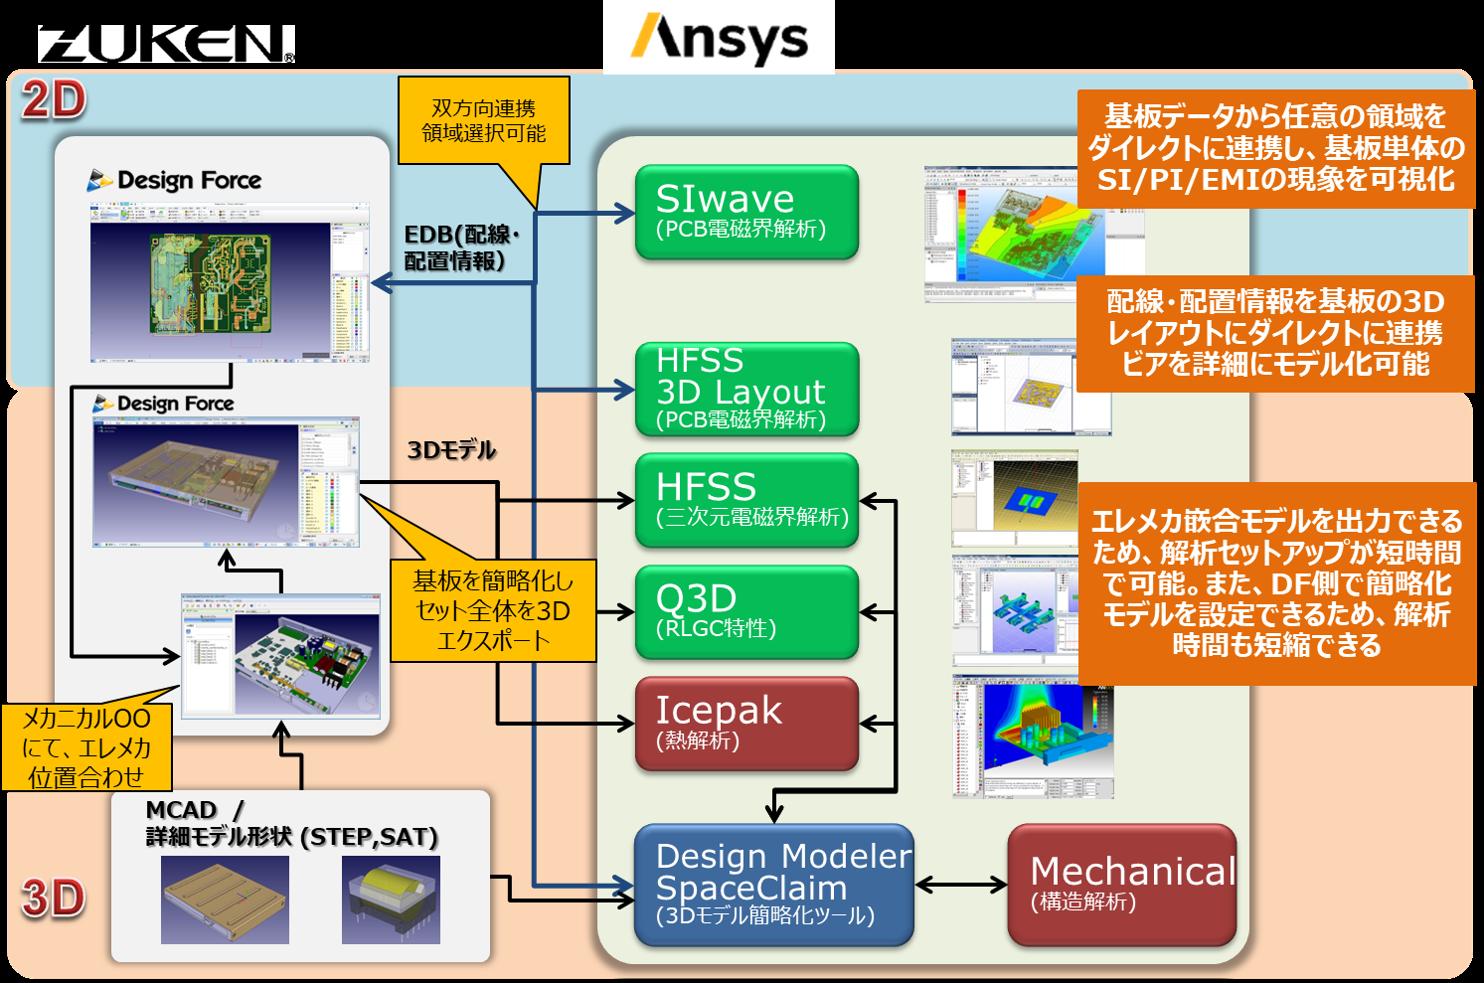 CR-8000/ANSYS ツール連携